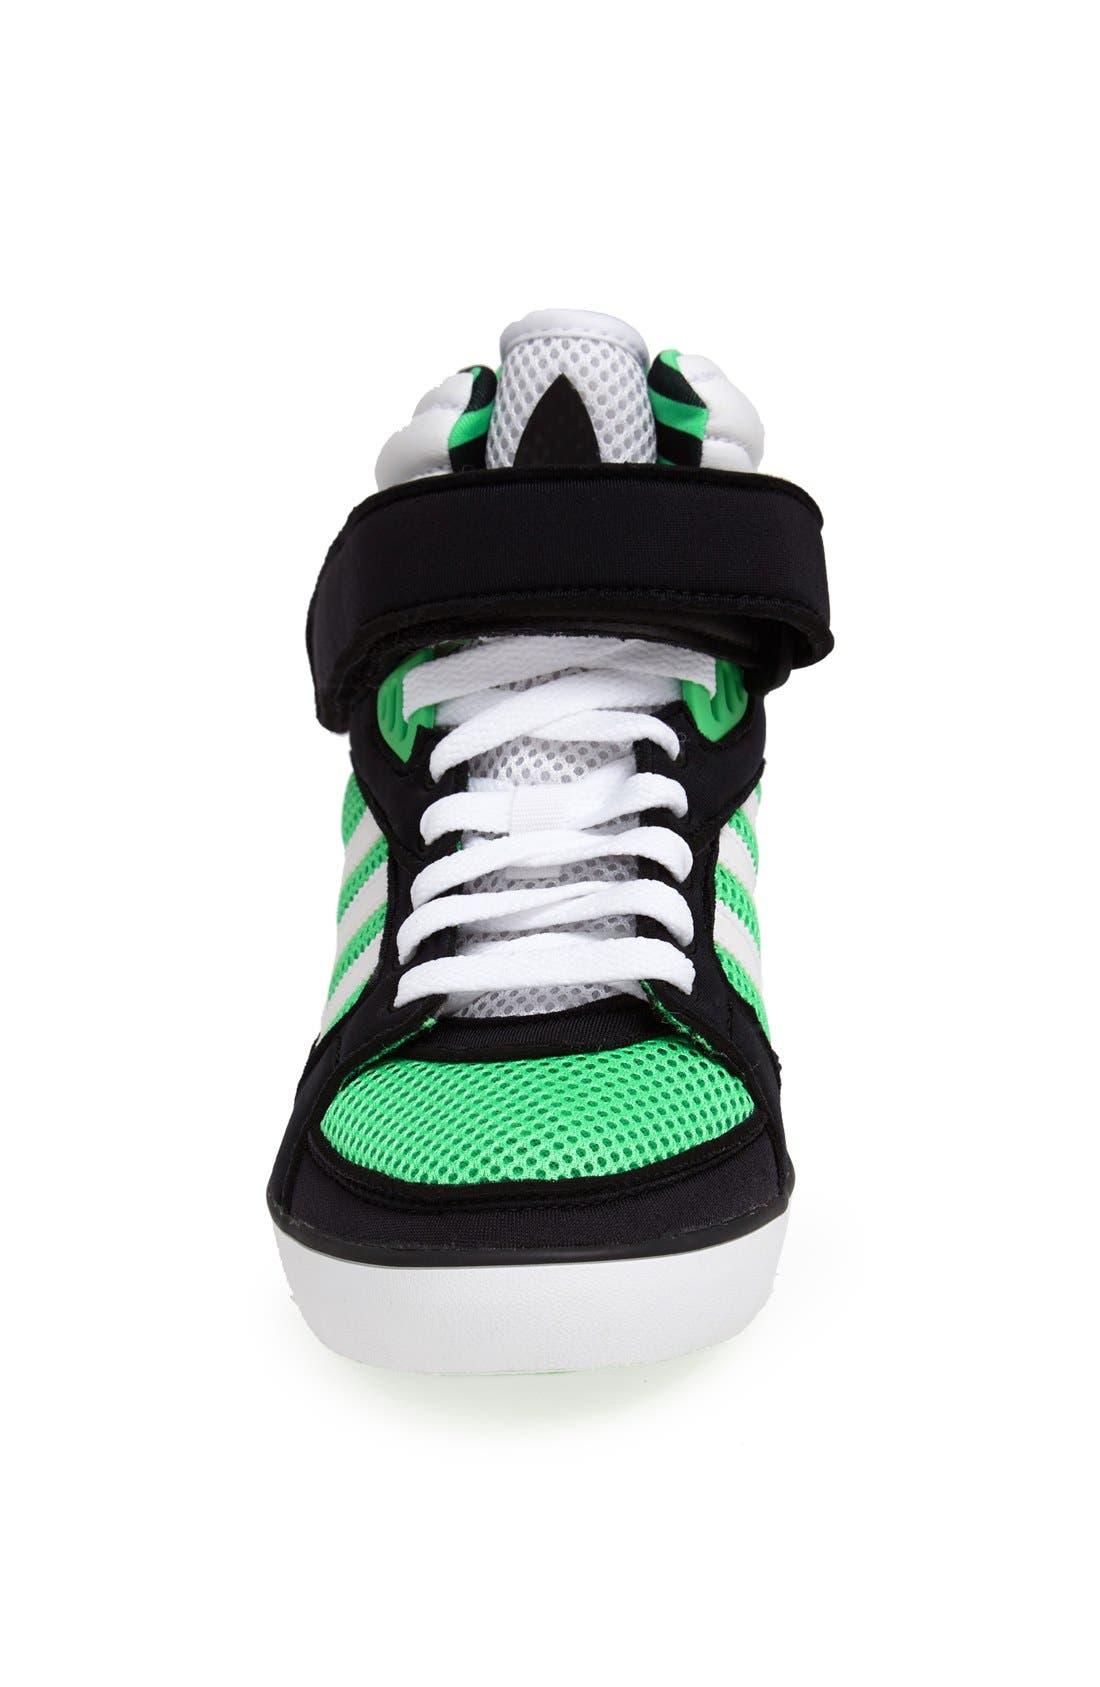 Alternate Image 3  - adidas 'Amerlight' Wedge Sneaker (Women)